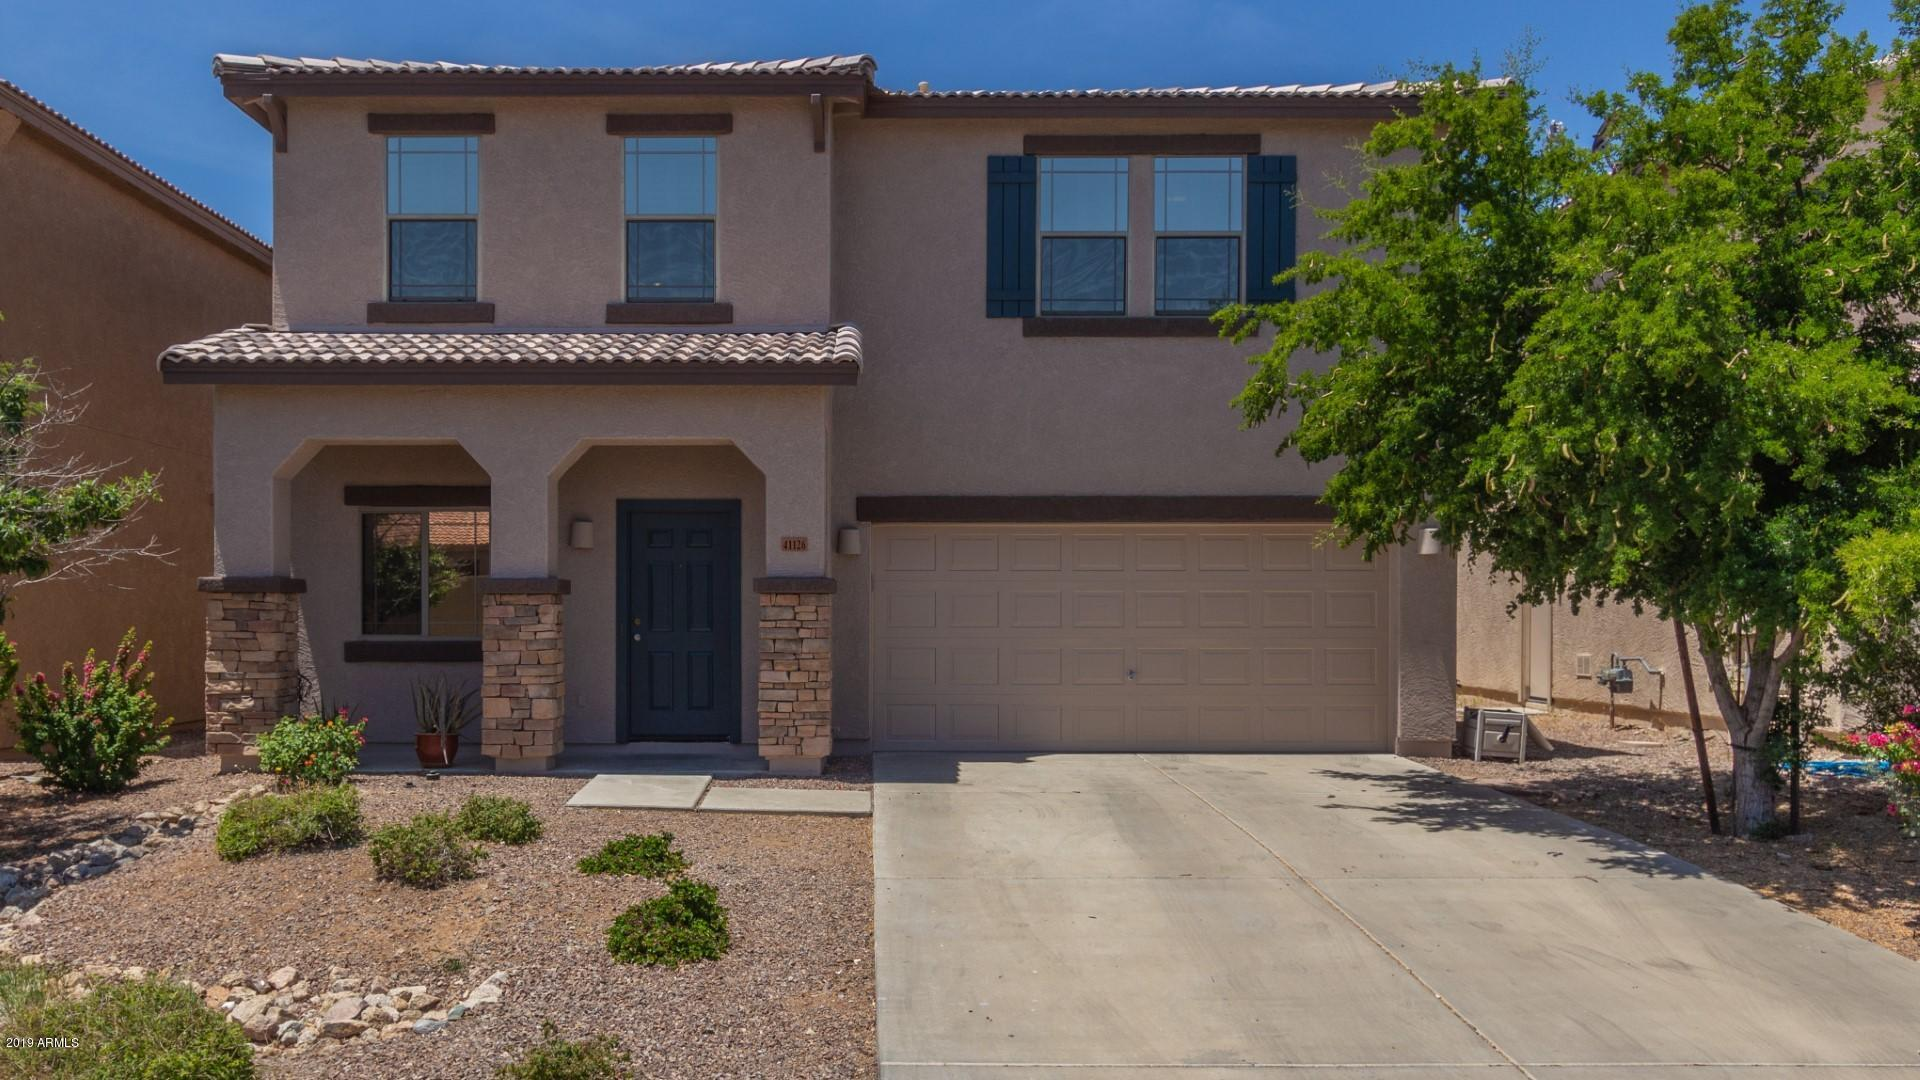 41126 N HUDSON Trail, Anthem in Maricopa County, AZ 85086 Home for Sale